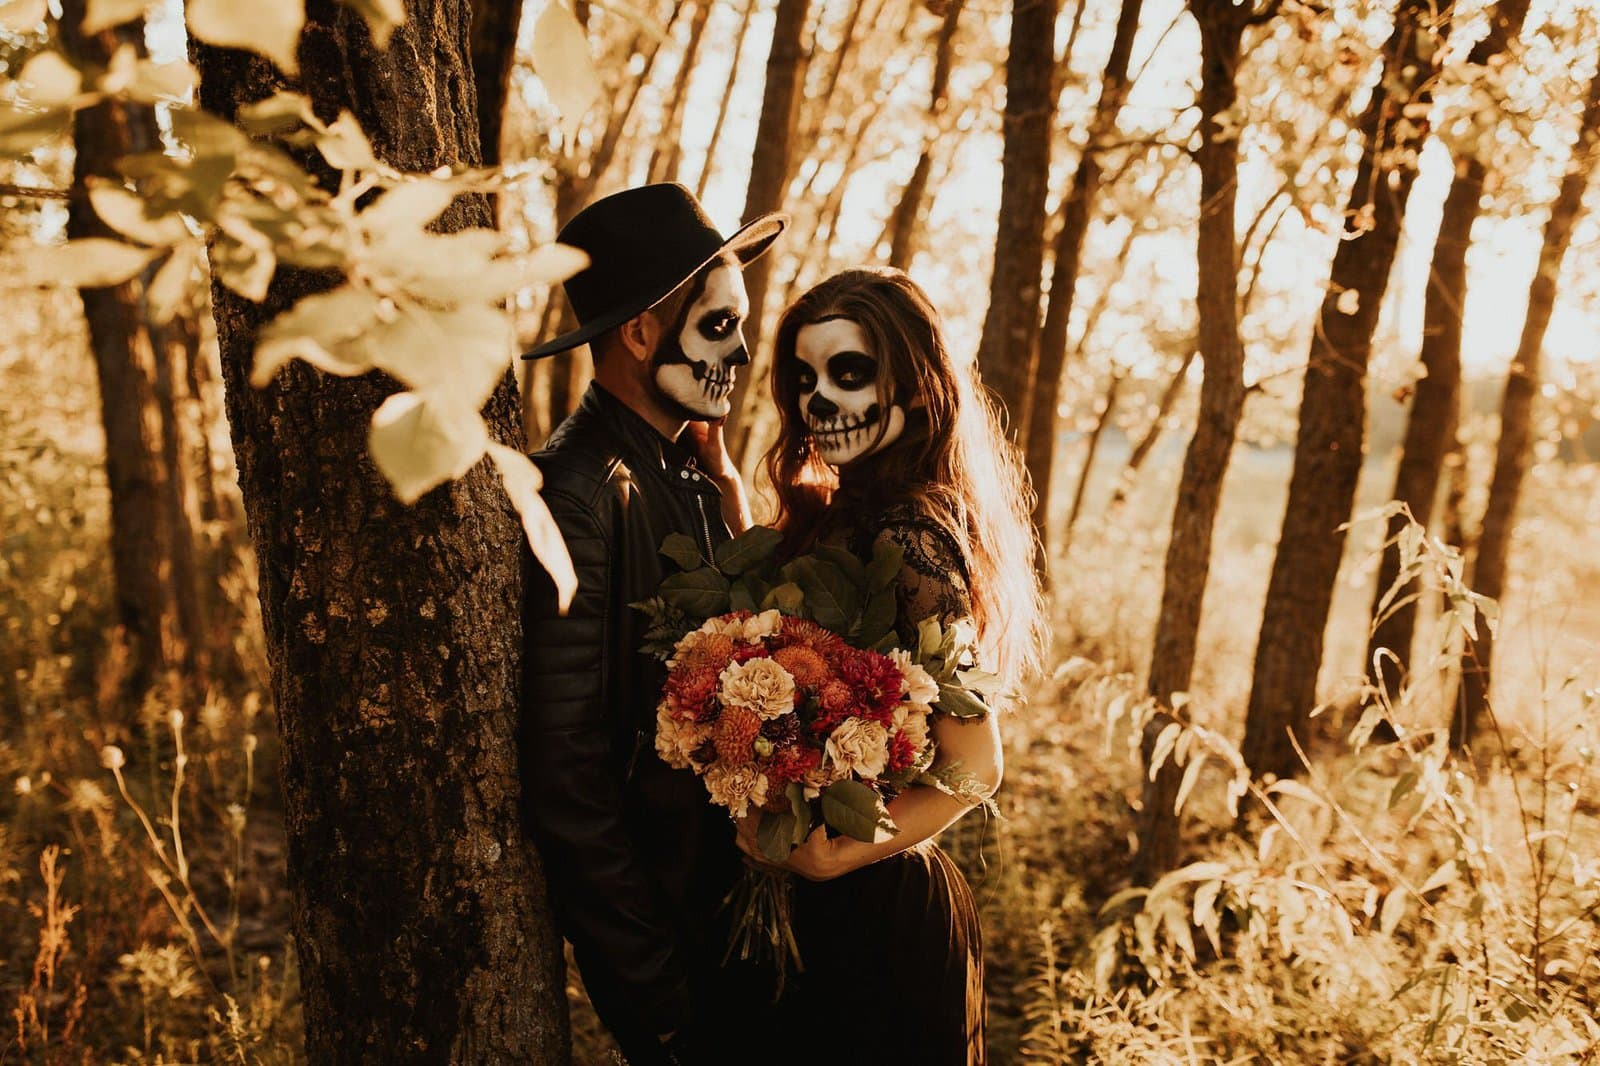 couple in woods embracing in skeleton makeup.